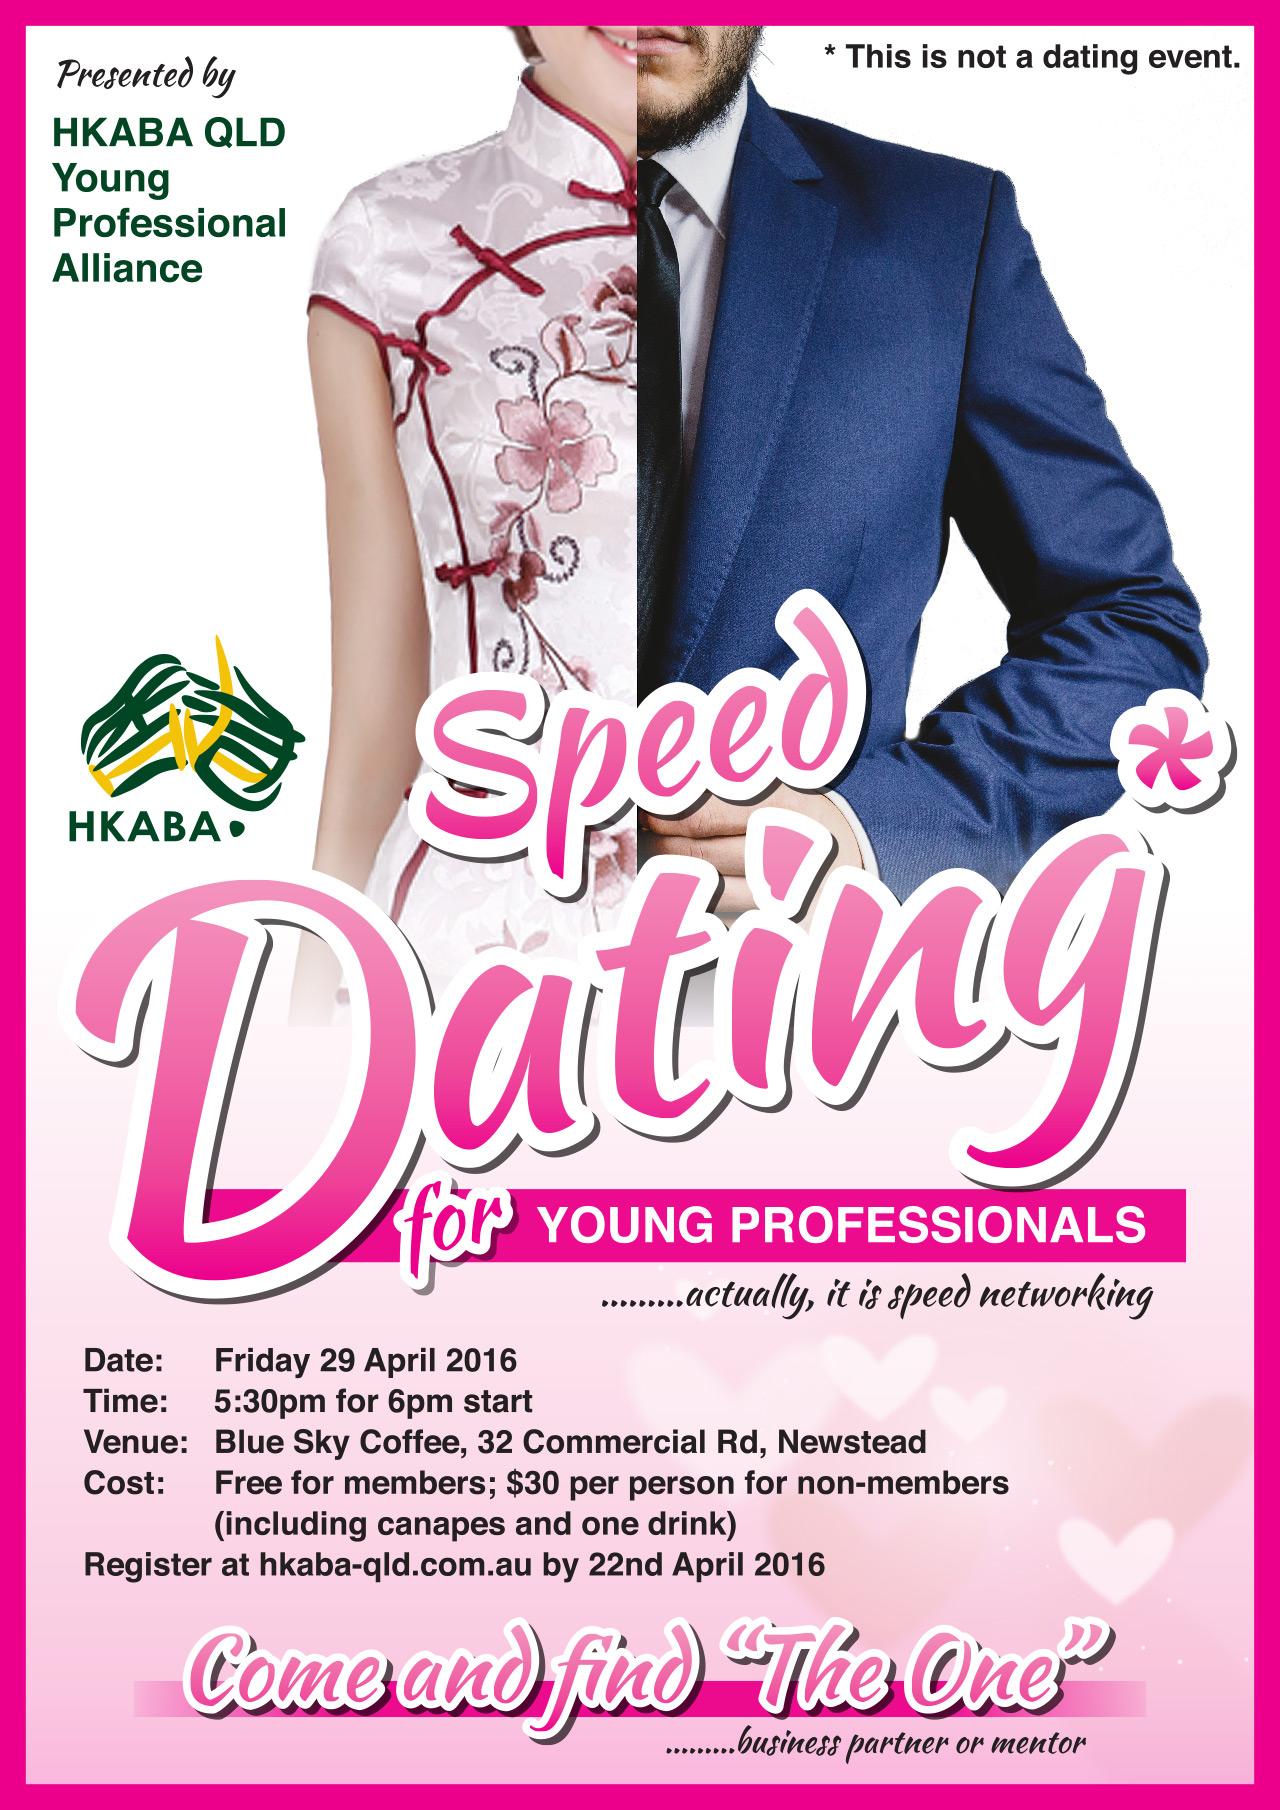 RITA: Speed dating advertisement